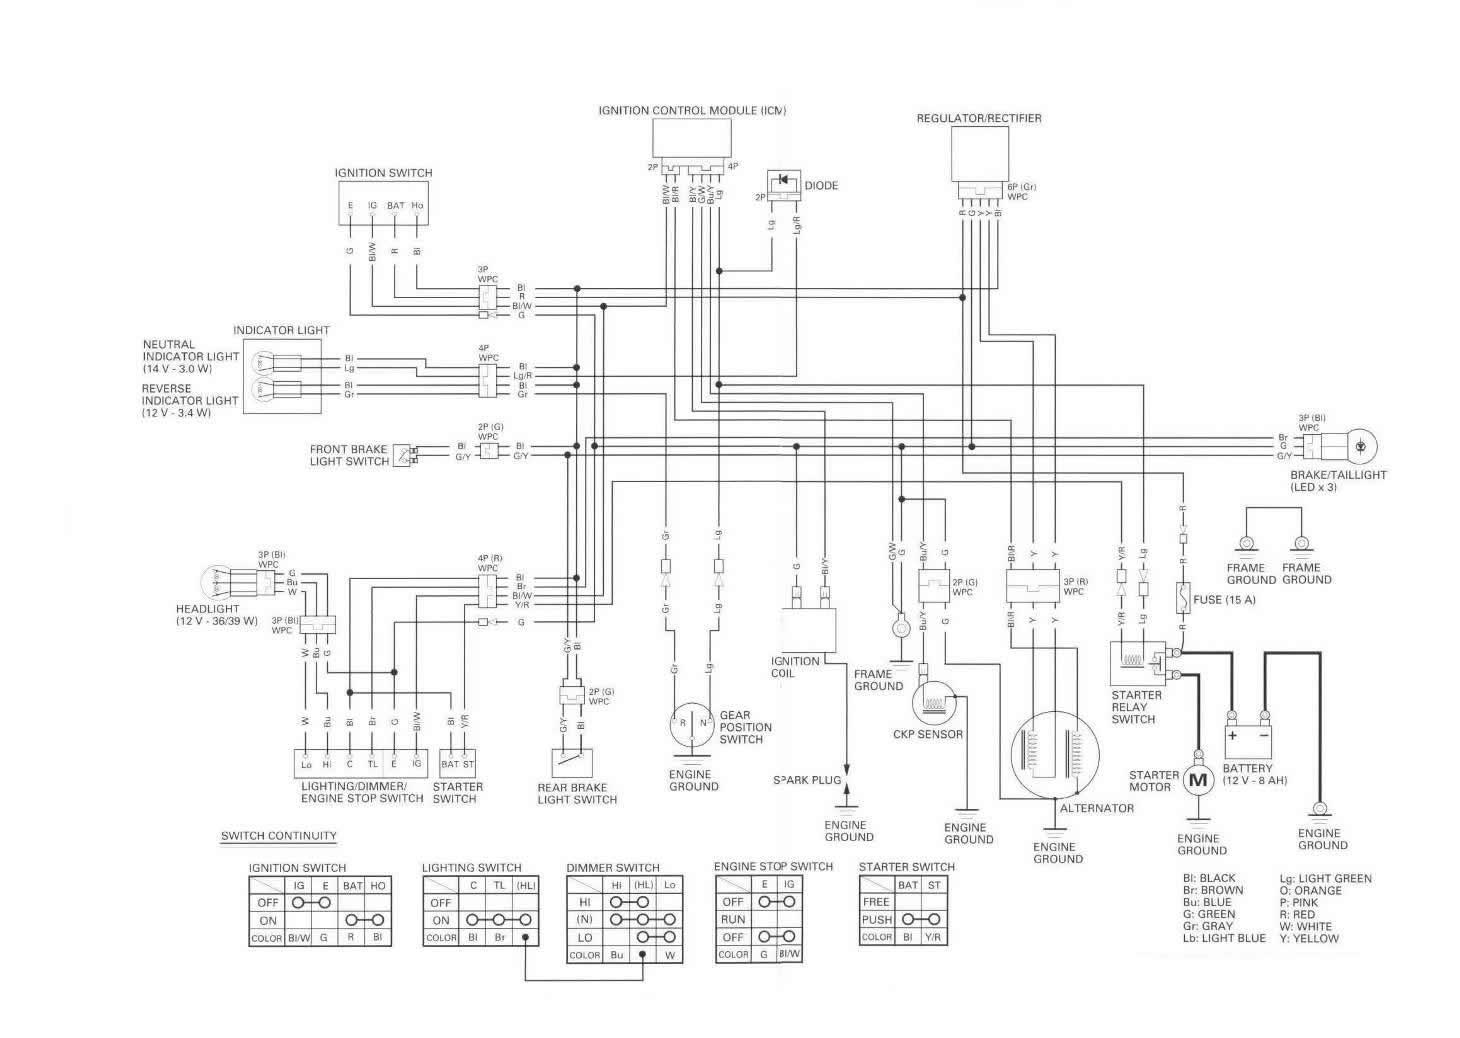 hight resolution of 2002 honda recon wiring diagram wiring diagrams terms 2002 honda atv wiring diagram